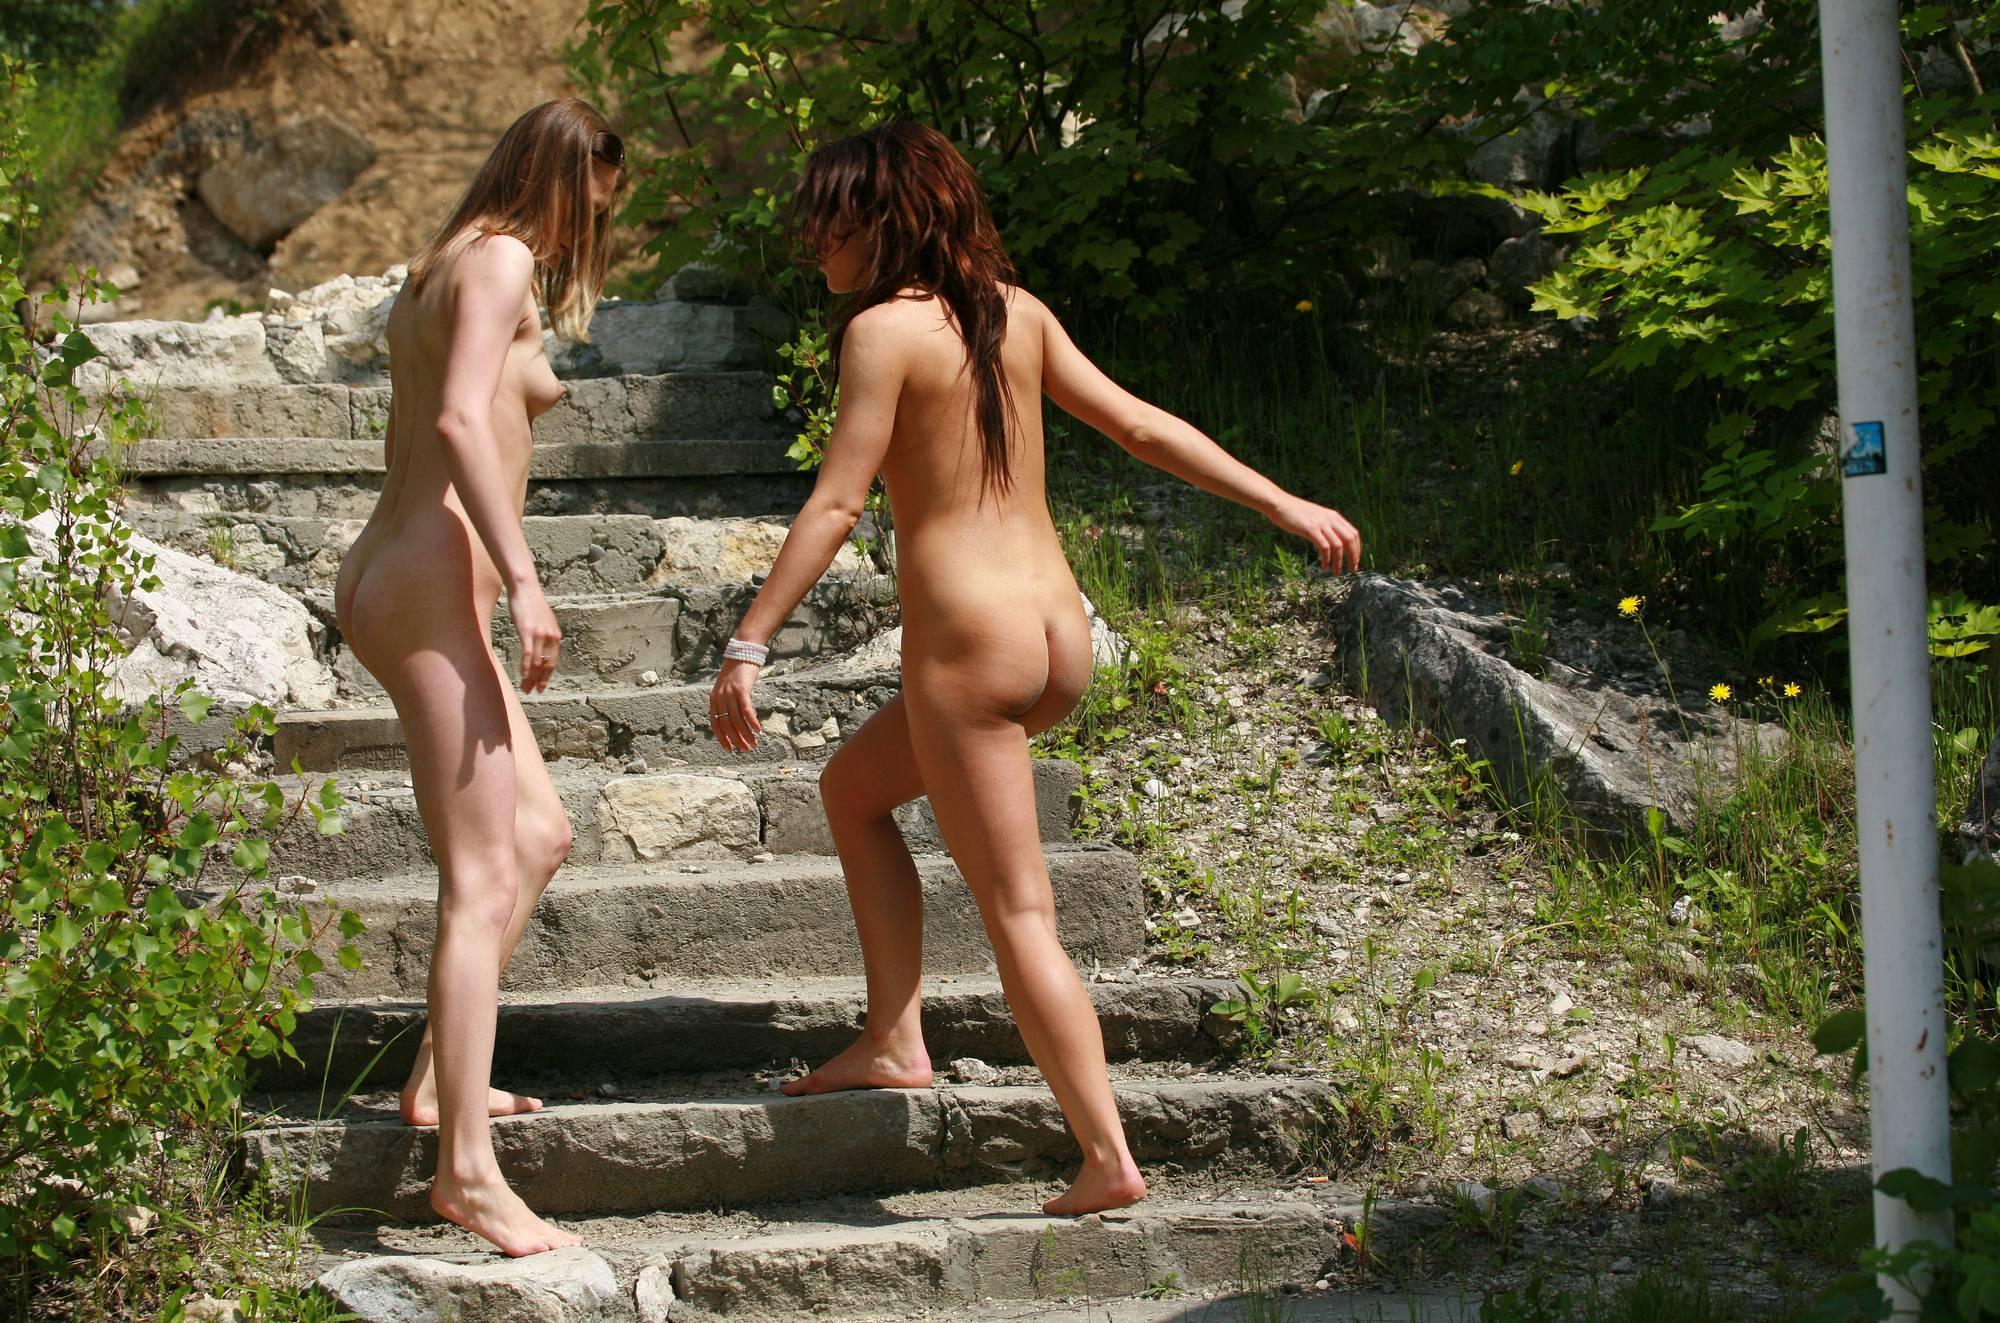 Nudist Gallery Sunny Day Naturist Walk - 1